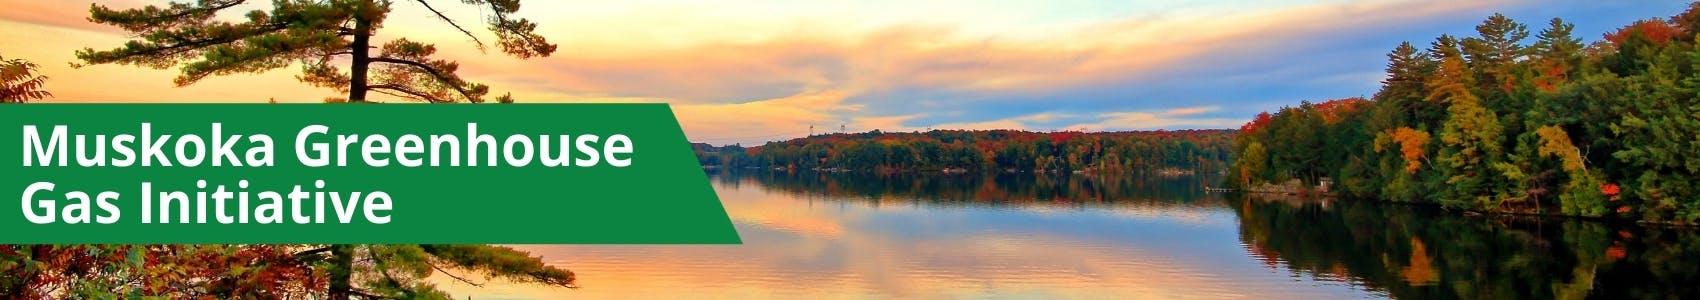 "A sunset photograph of a lake landscape within Muskoka. Banner reads ""Muskoka Greenhouse Gas Inventory"""